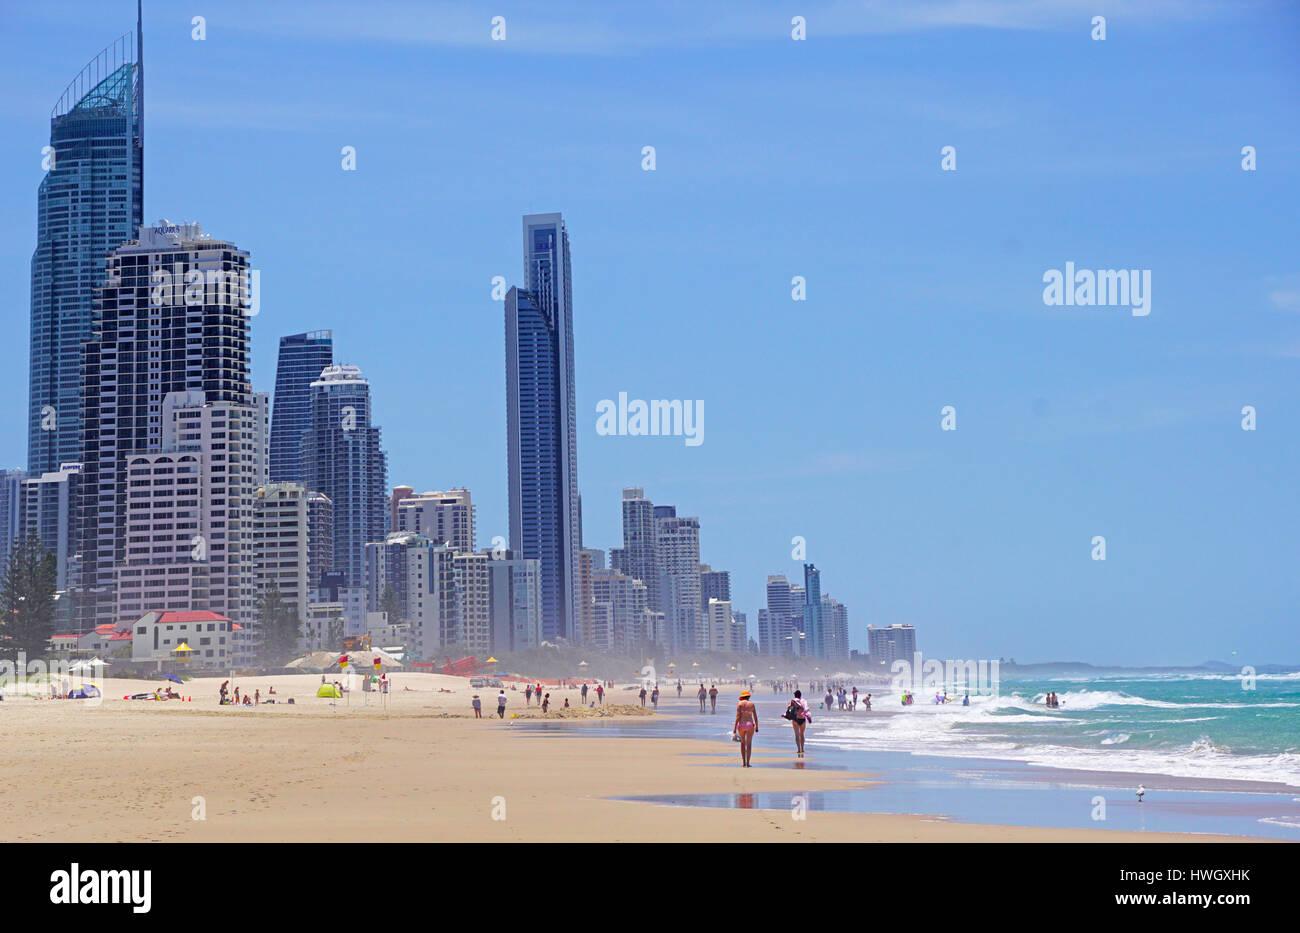 Bañistas en la playa de Surfers Paradise, Queensland, Australia. Imagen De Stock